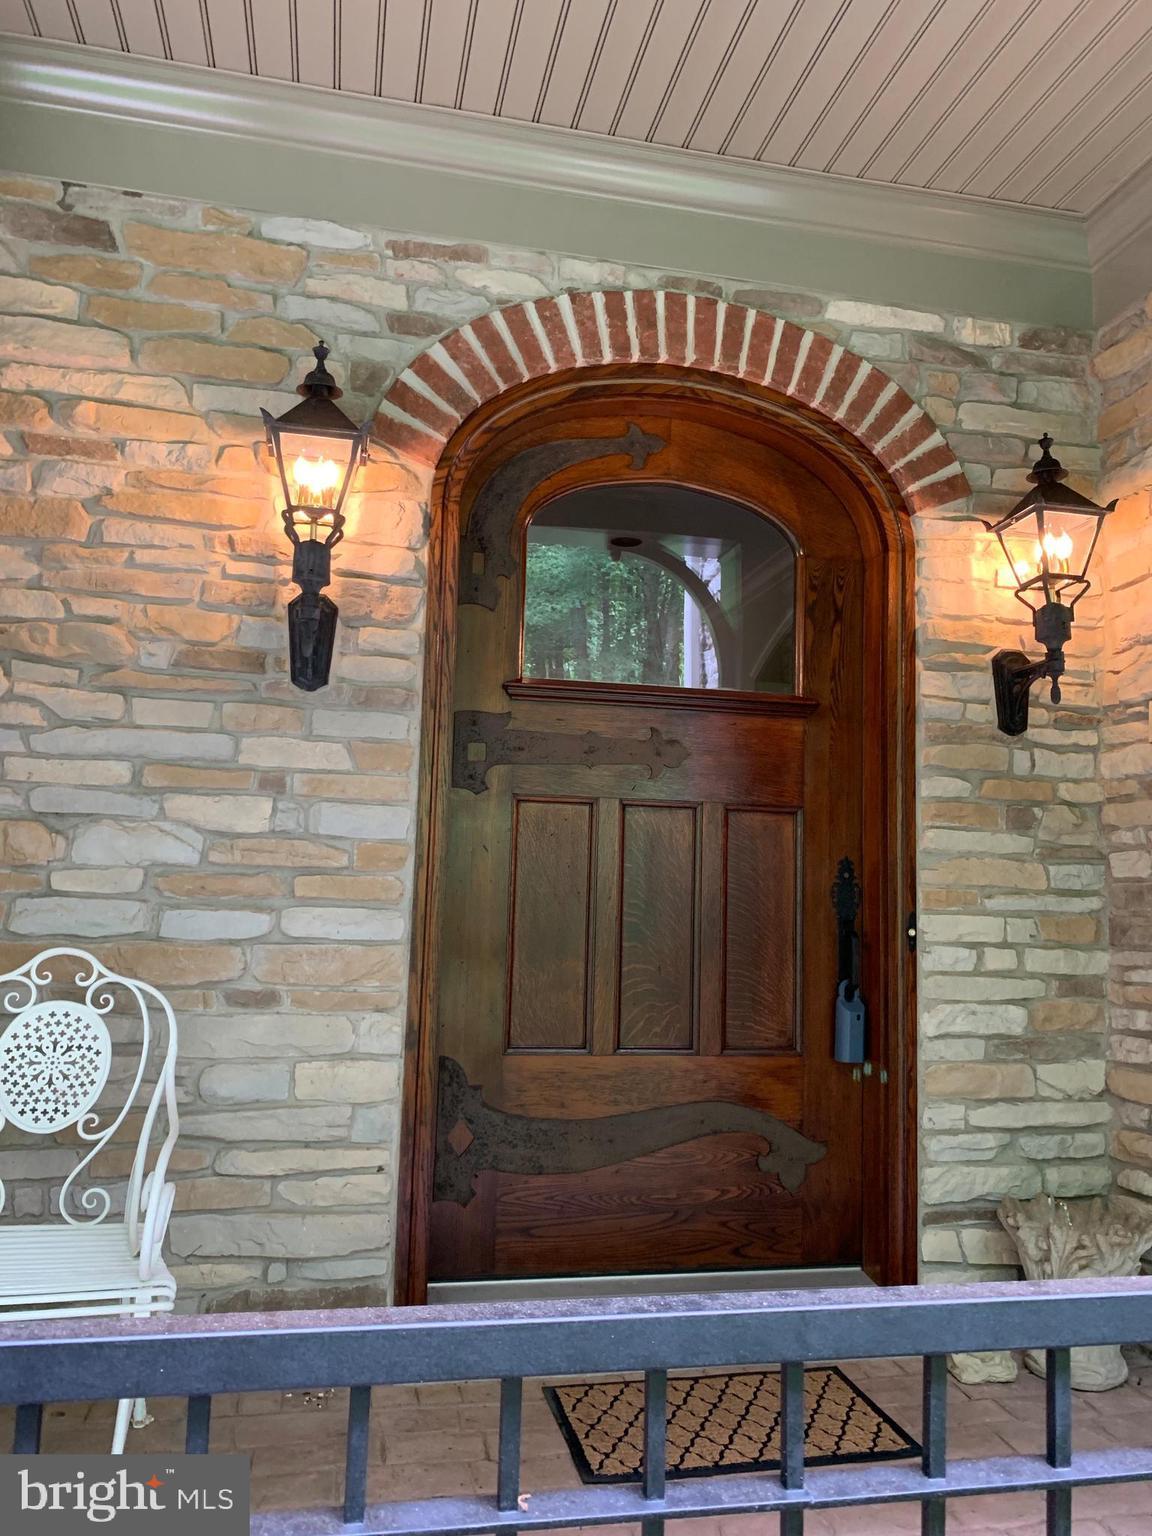 Home was built around one of a kind front door